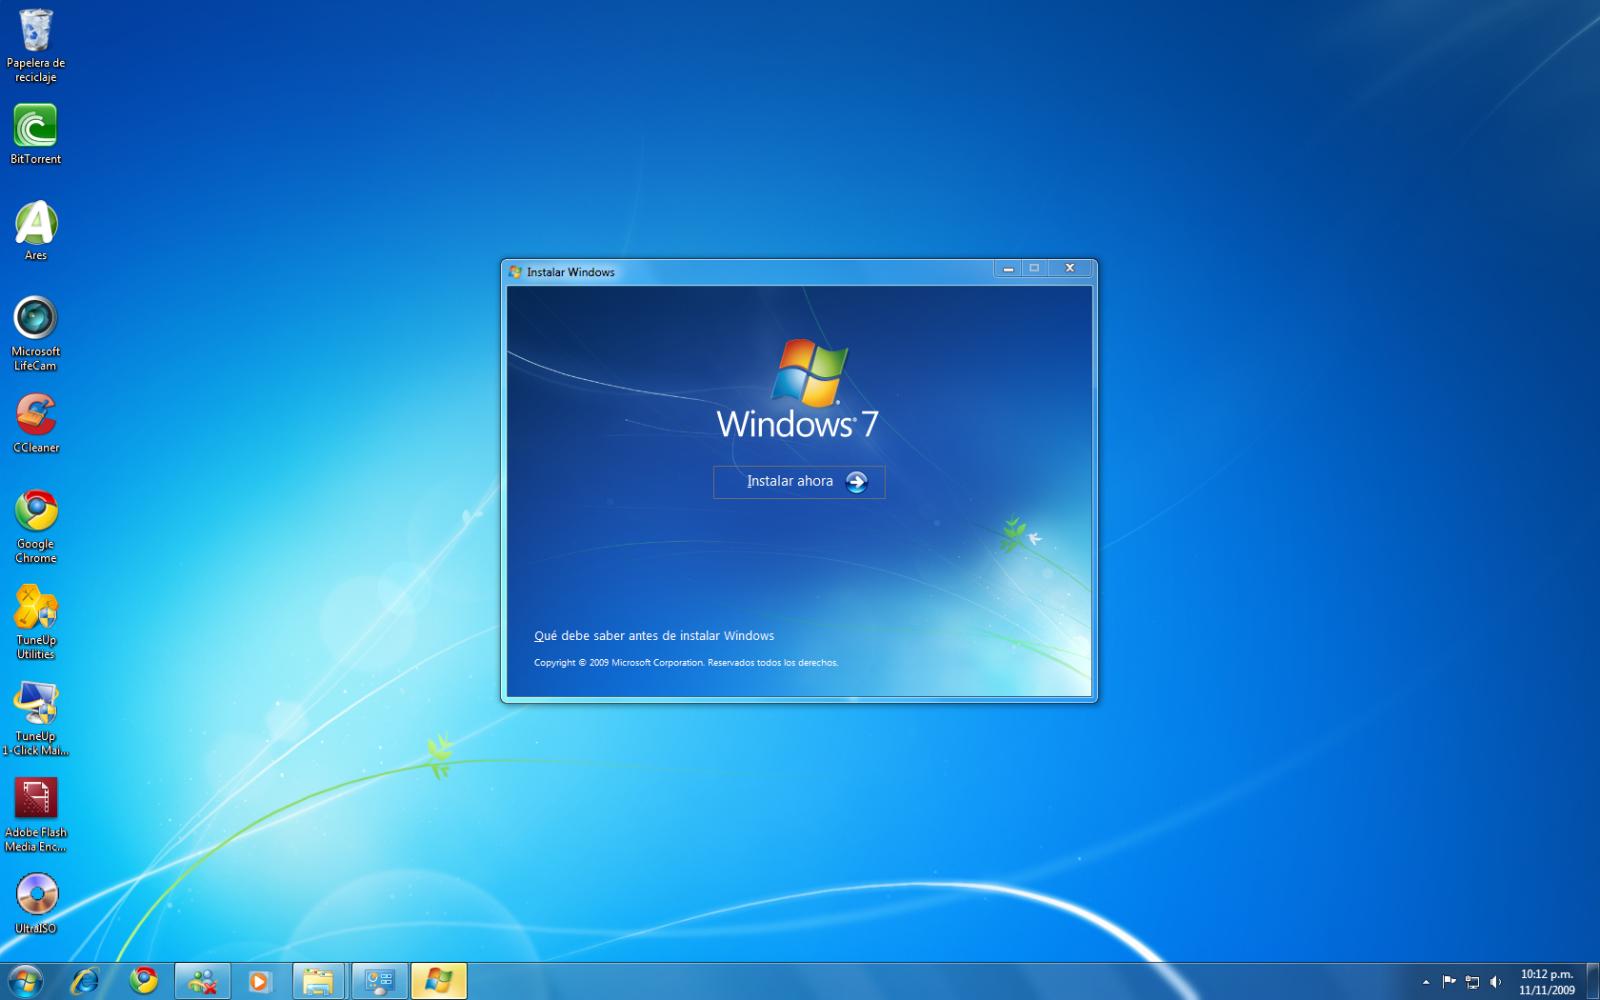 x64 windows 7 ultimate x86 windows 7 ultimate x64 windows 7 ...